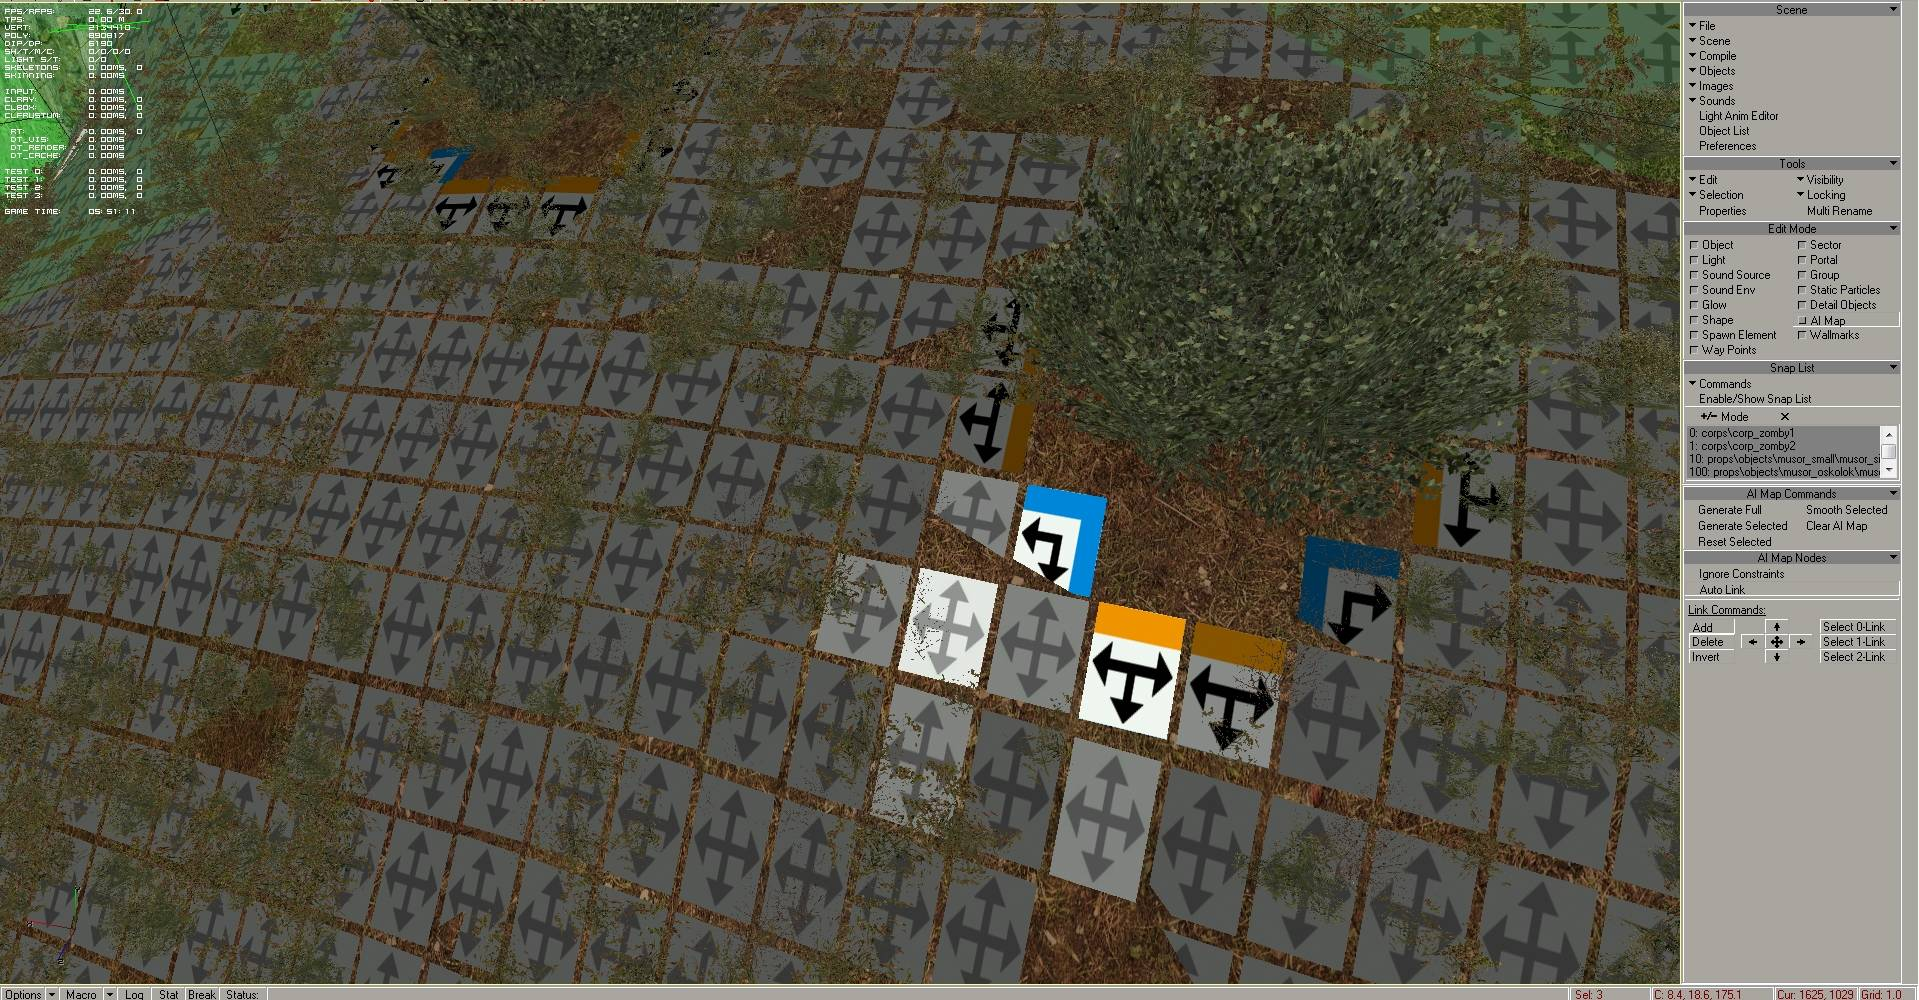 Selected ai nodes